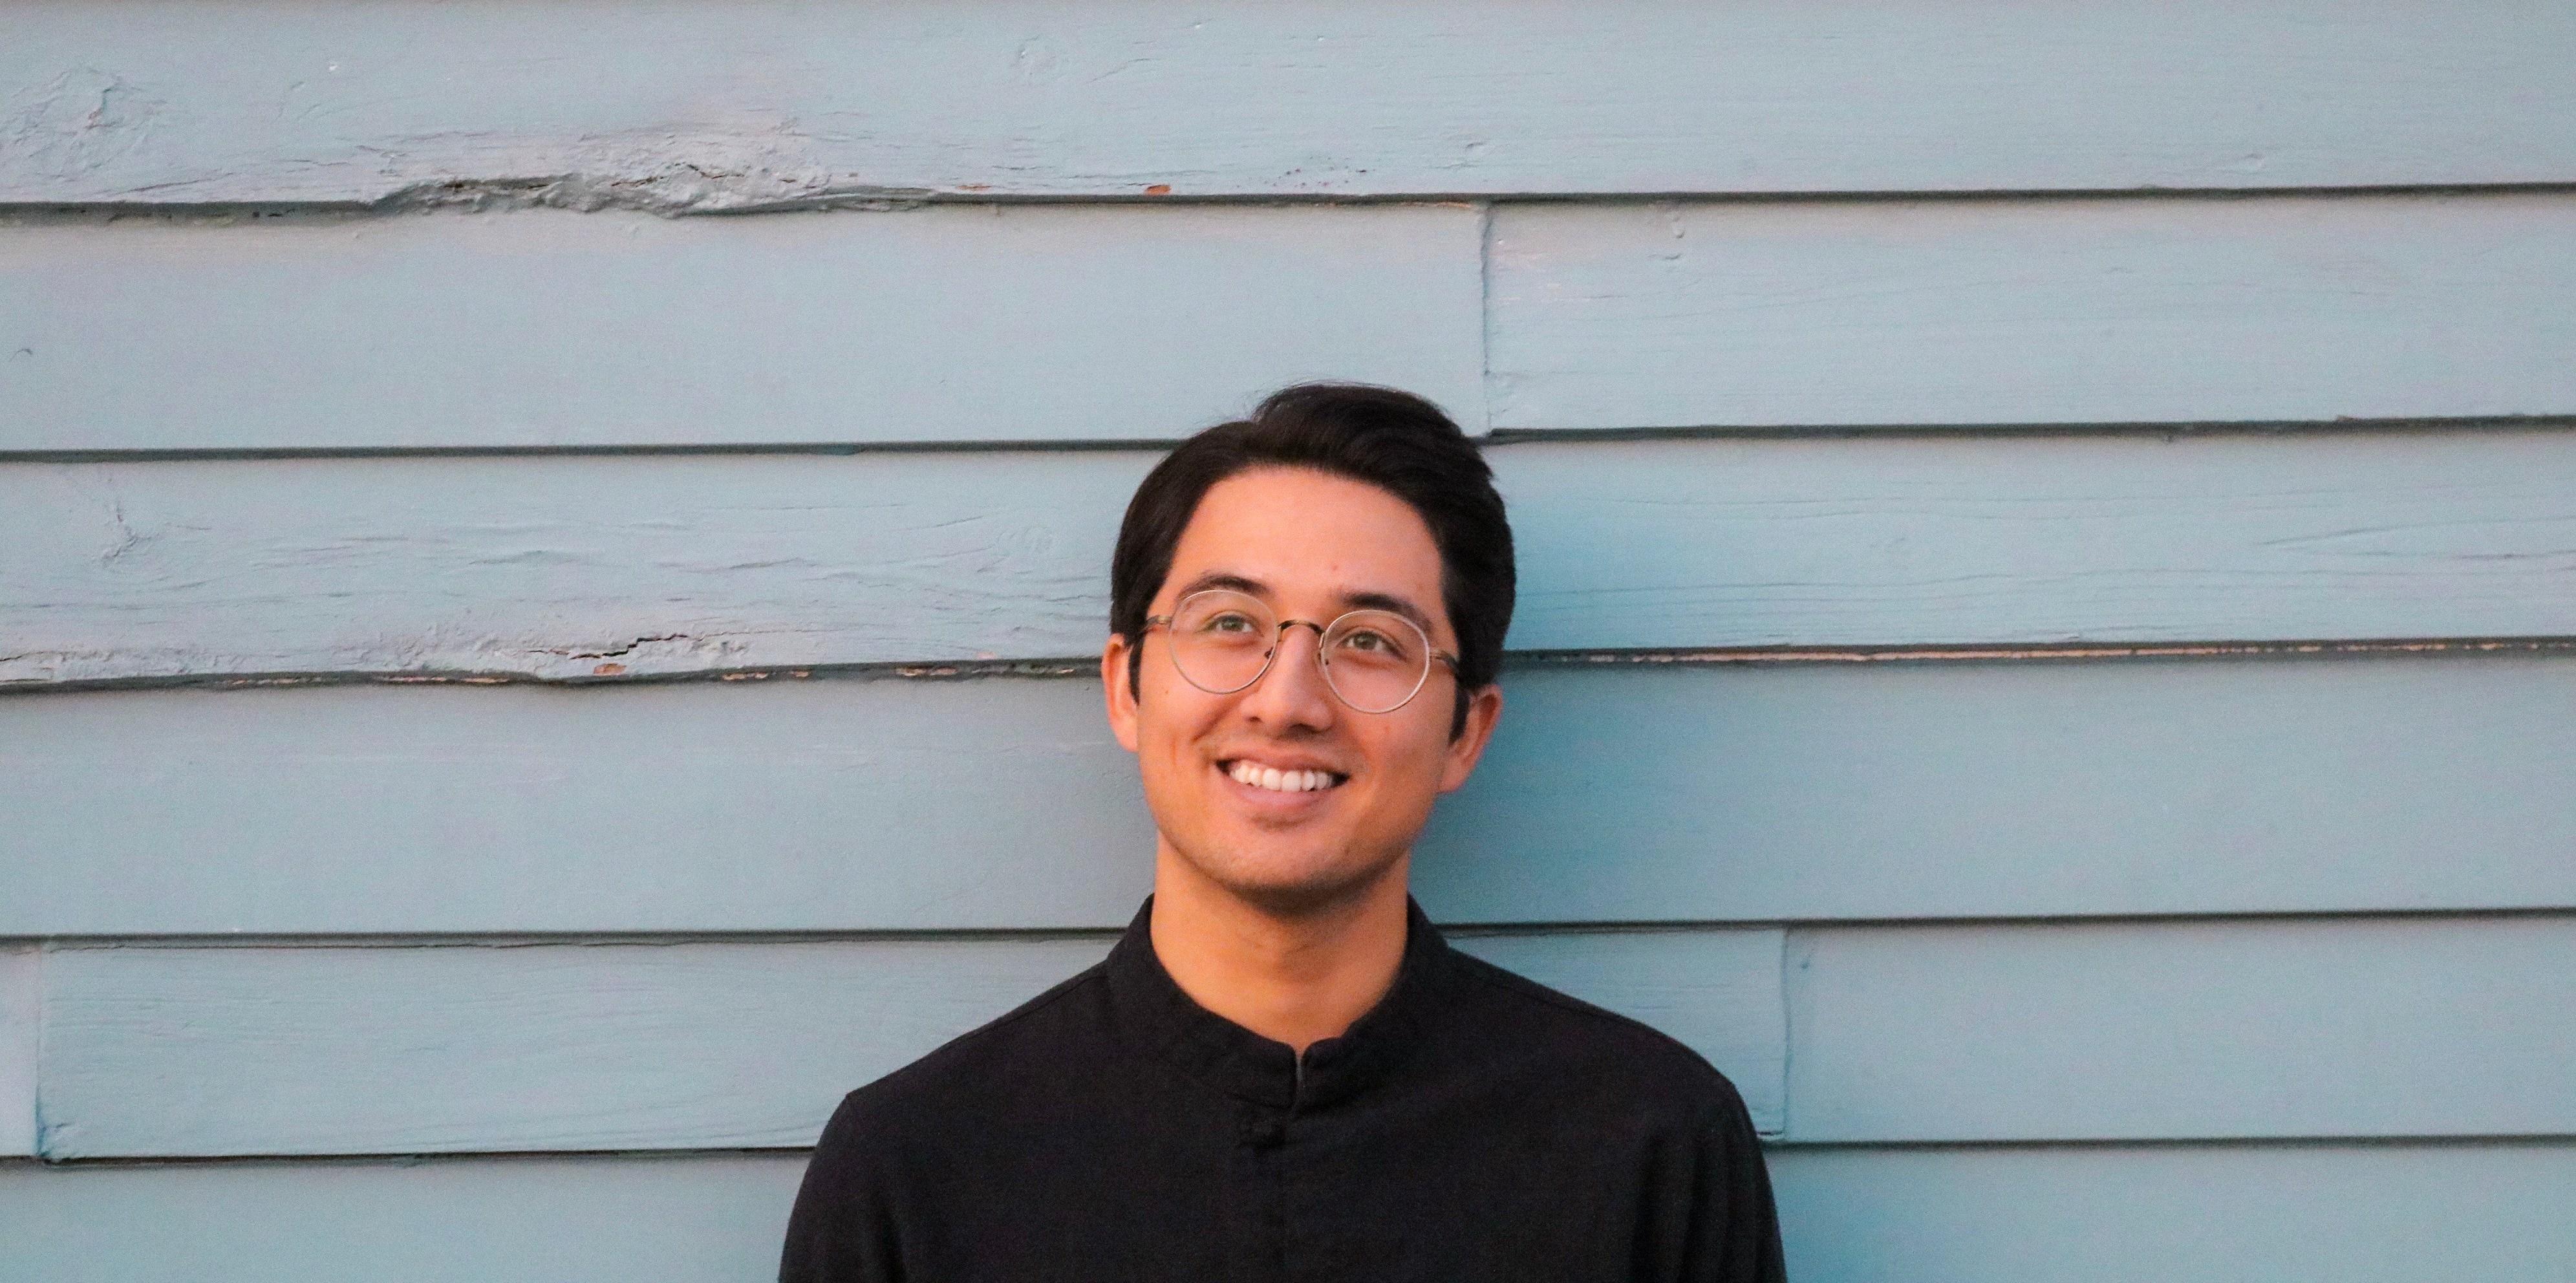 Dylan Tran Composer Choral Composer Vietnamese American Artist